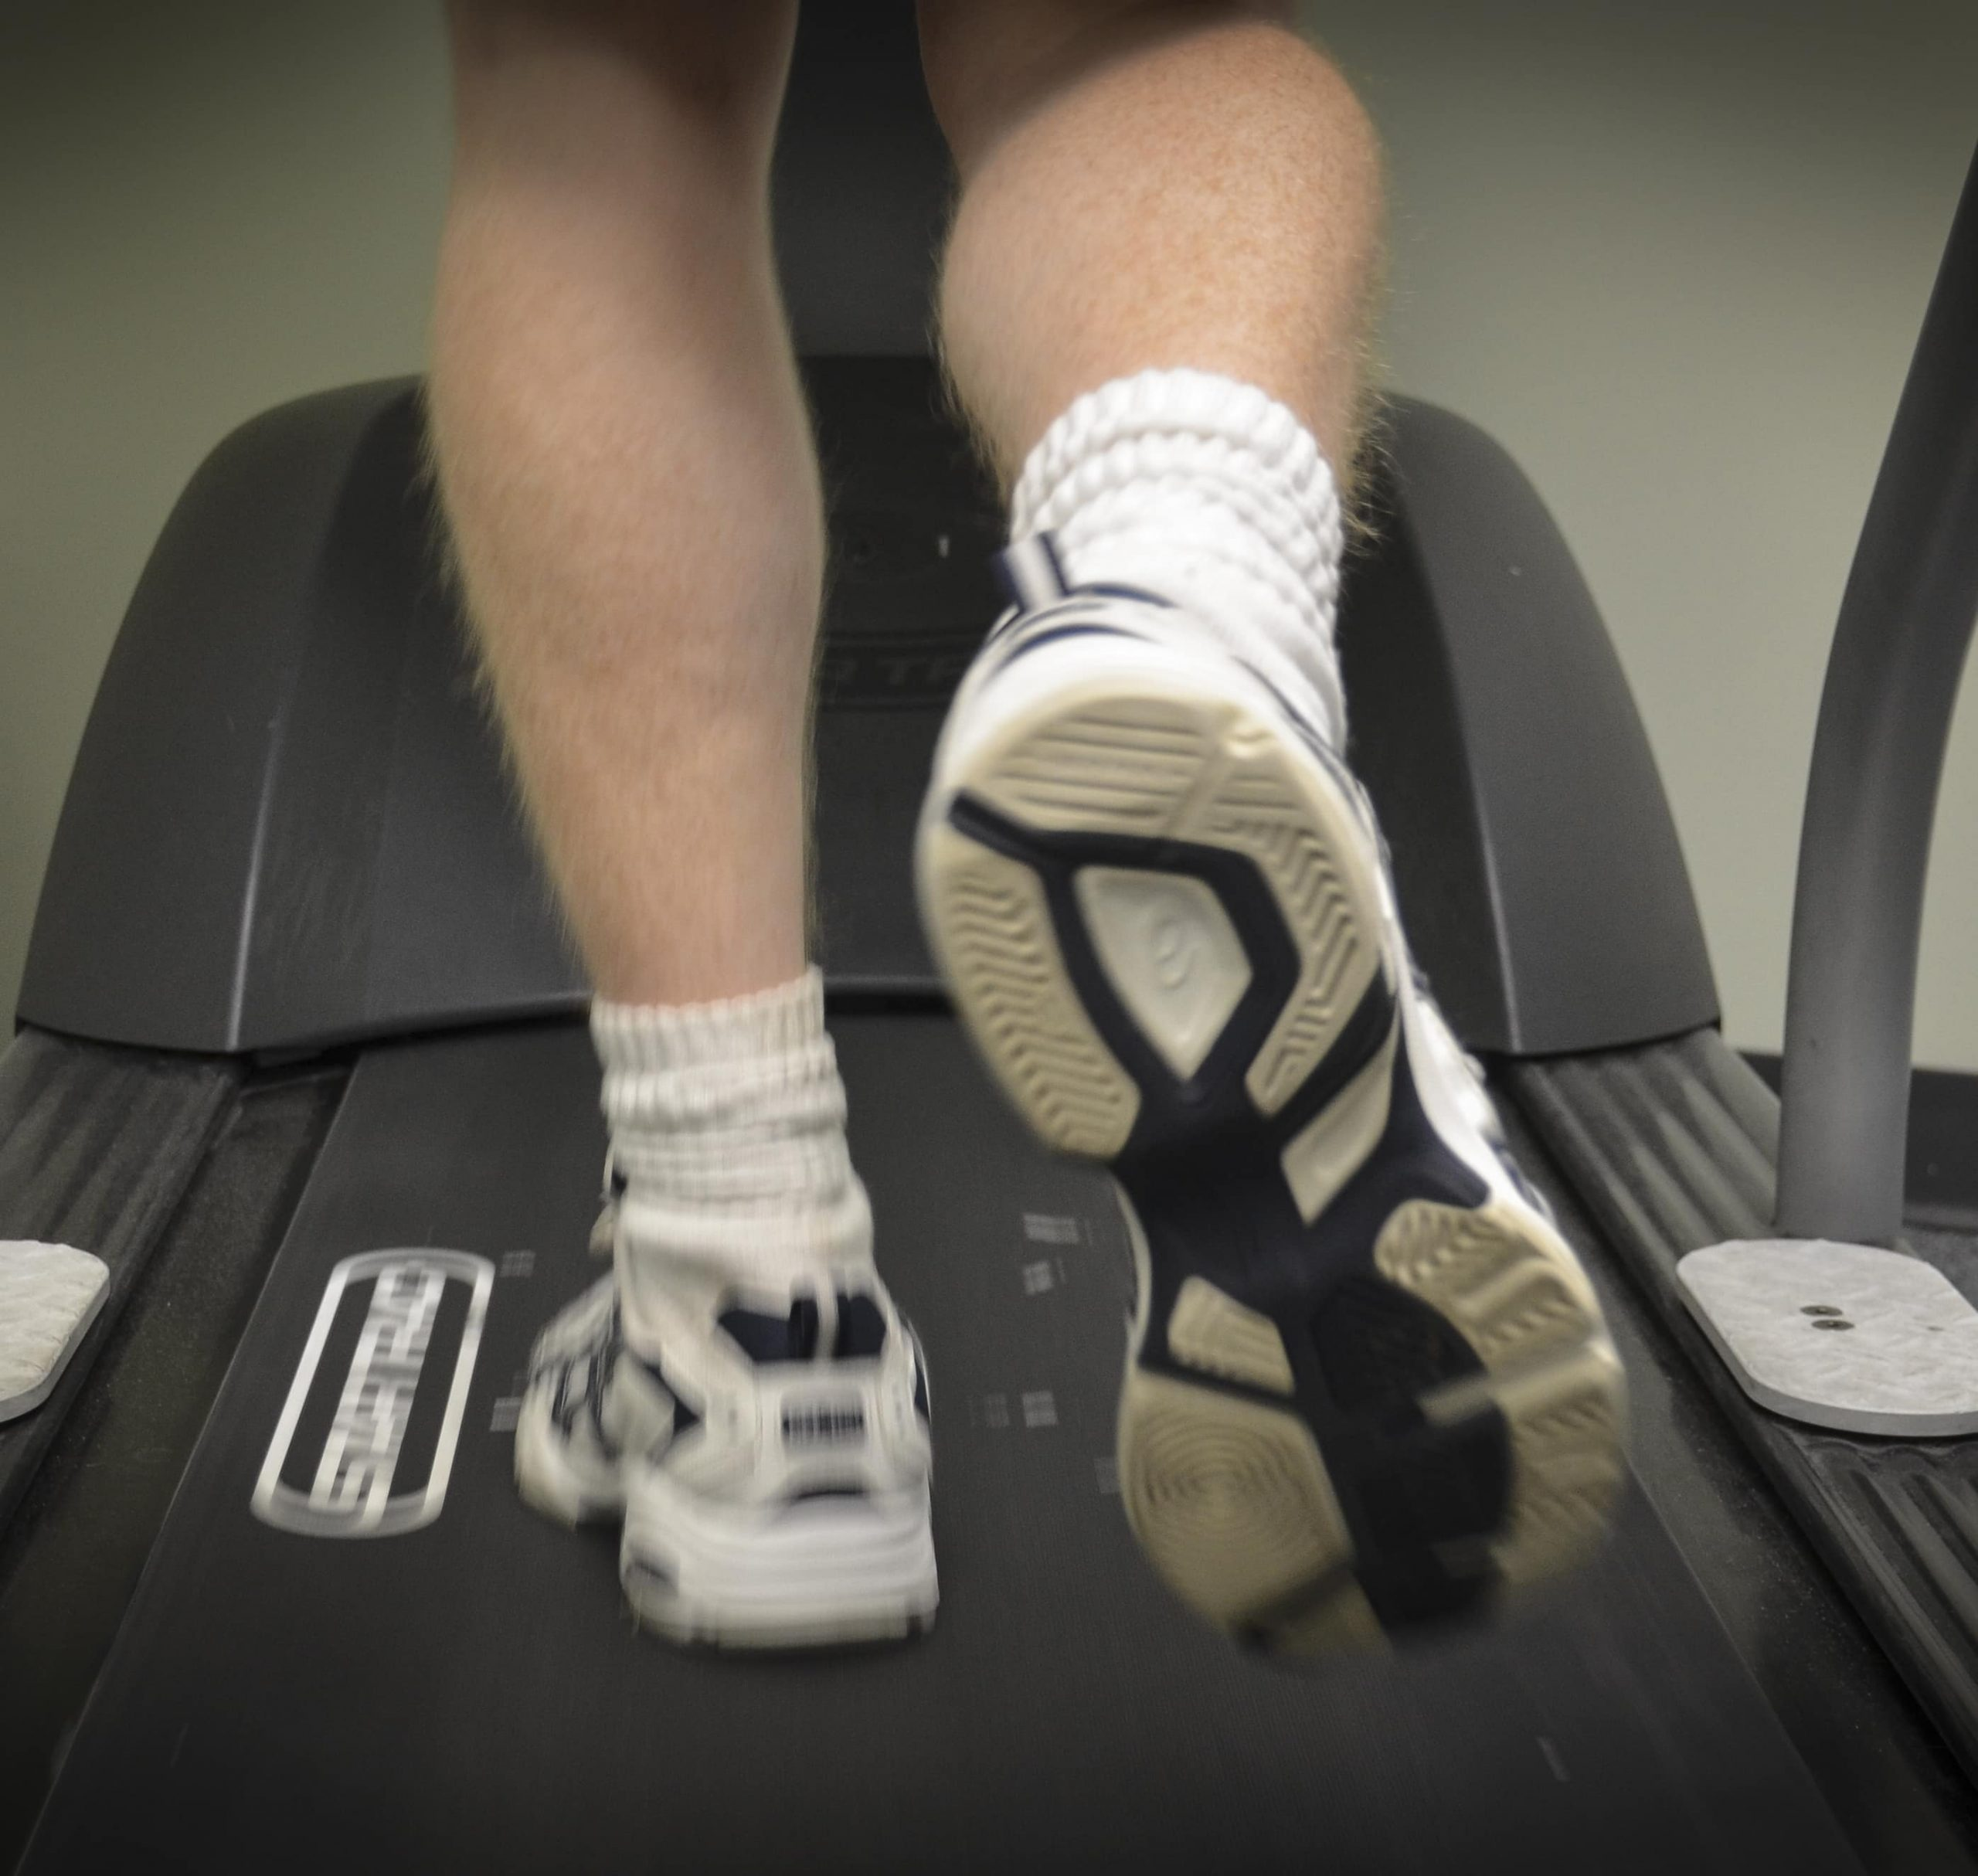 Bexley Foot Clinic - Gait 4